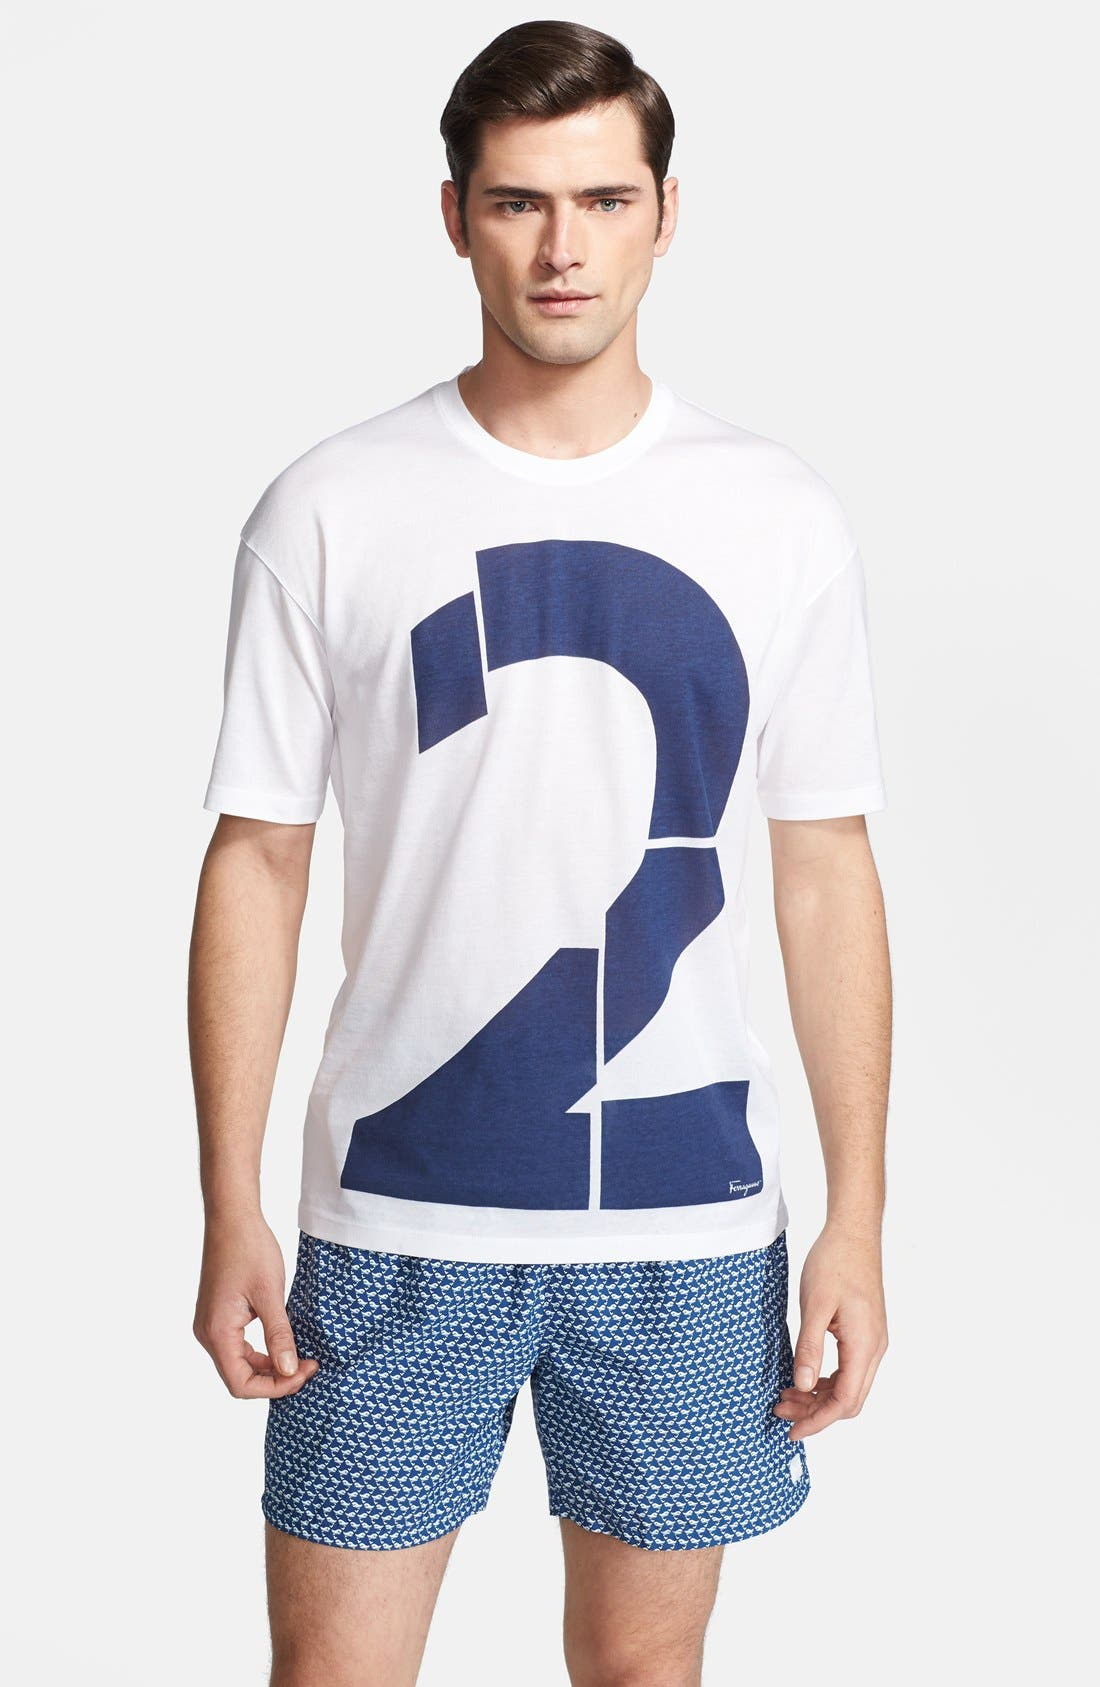 Alternate Image 1 Selected - Salvatore Ferragamo 'Number 2' Crewneck T-Shirt